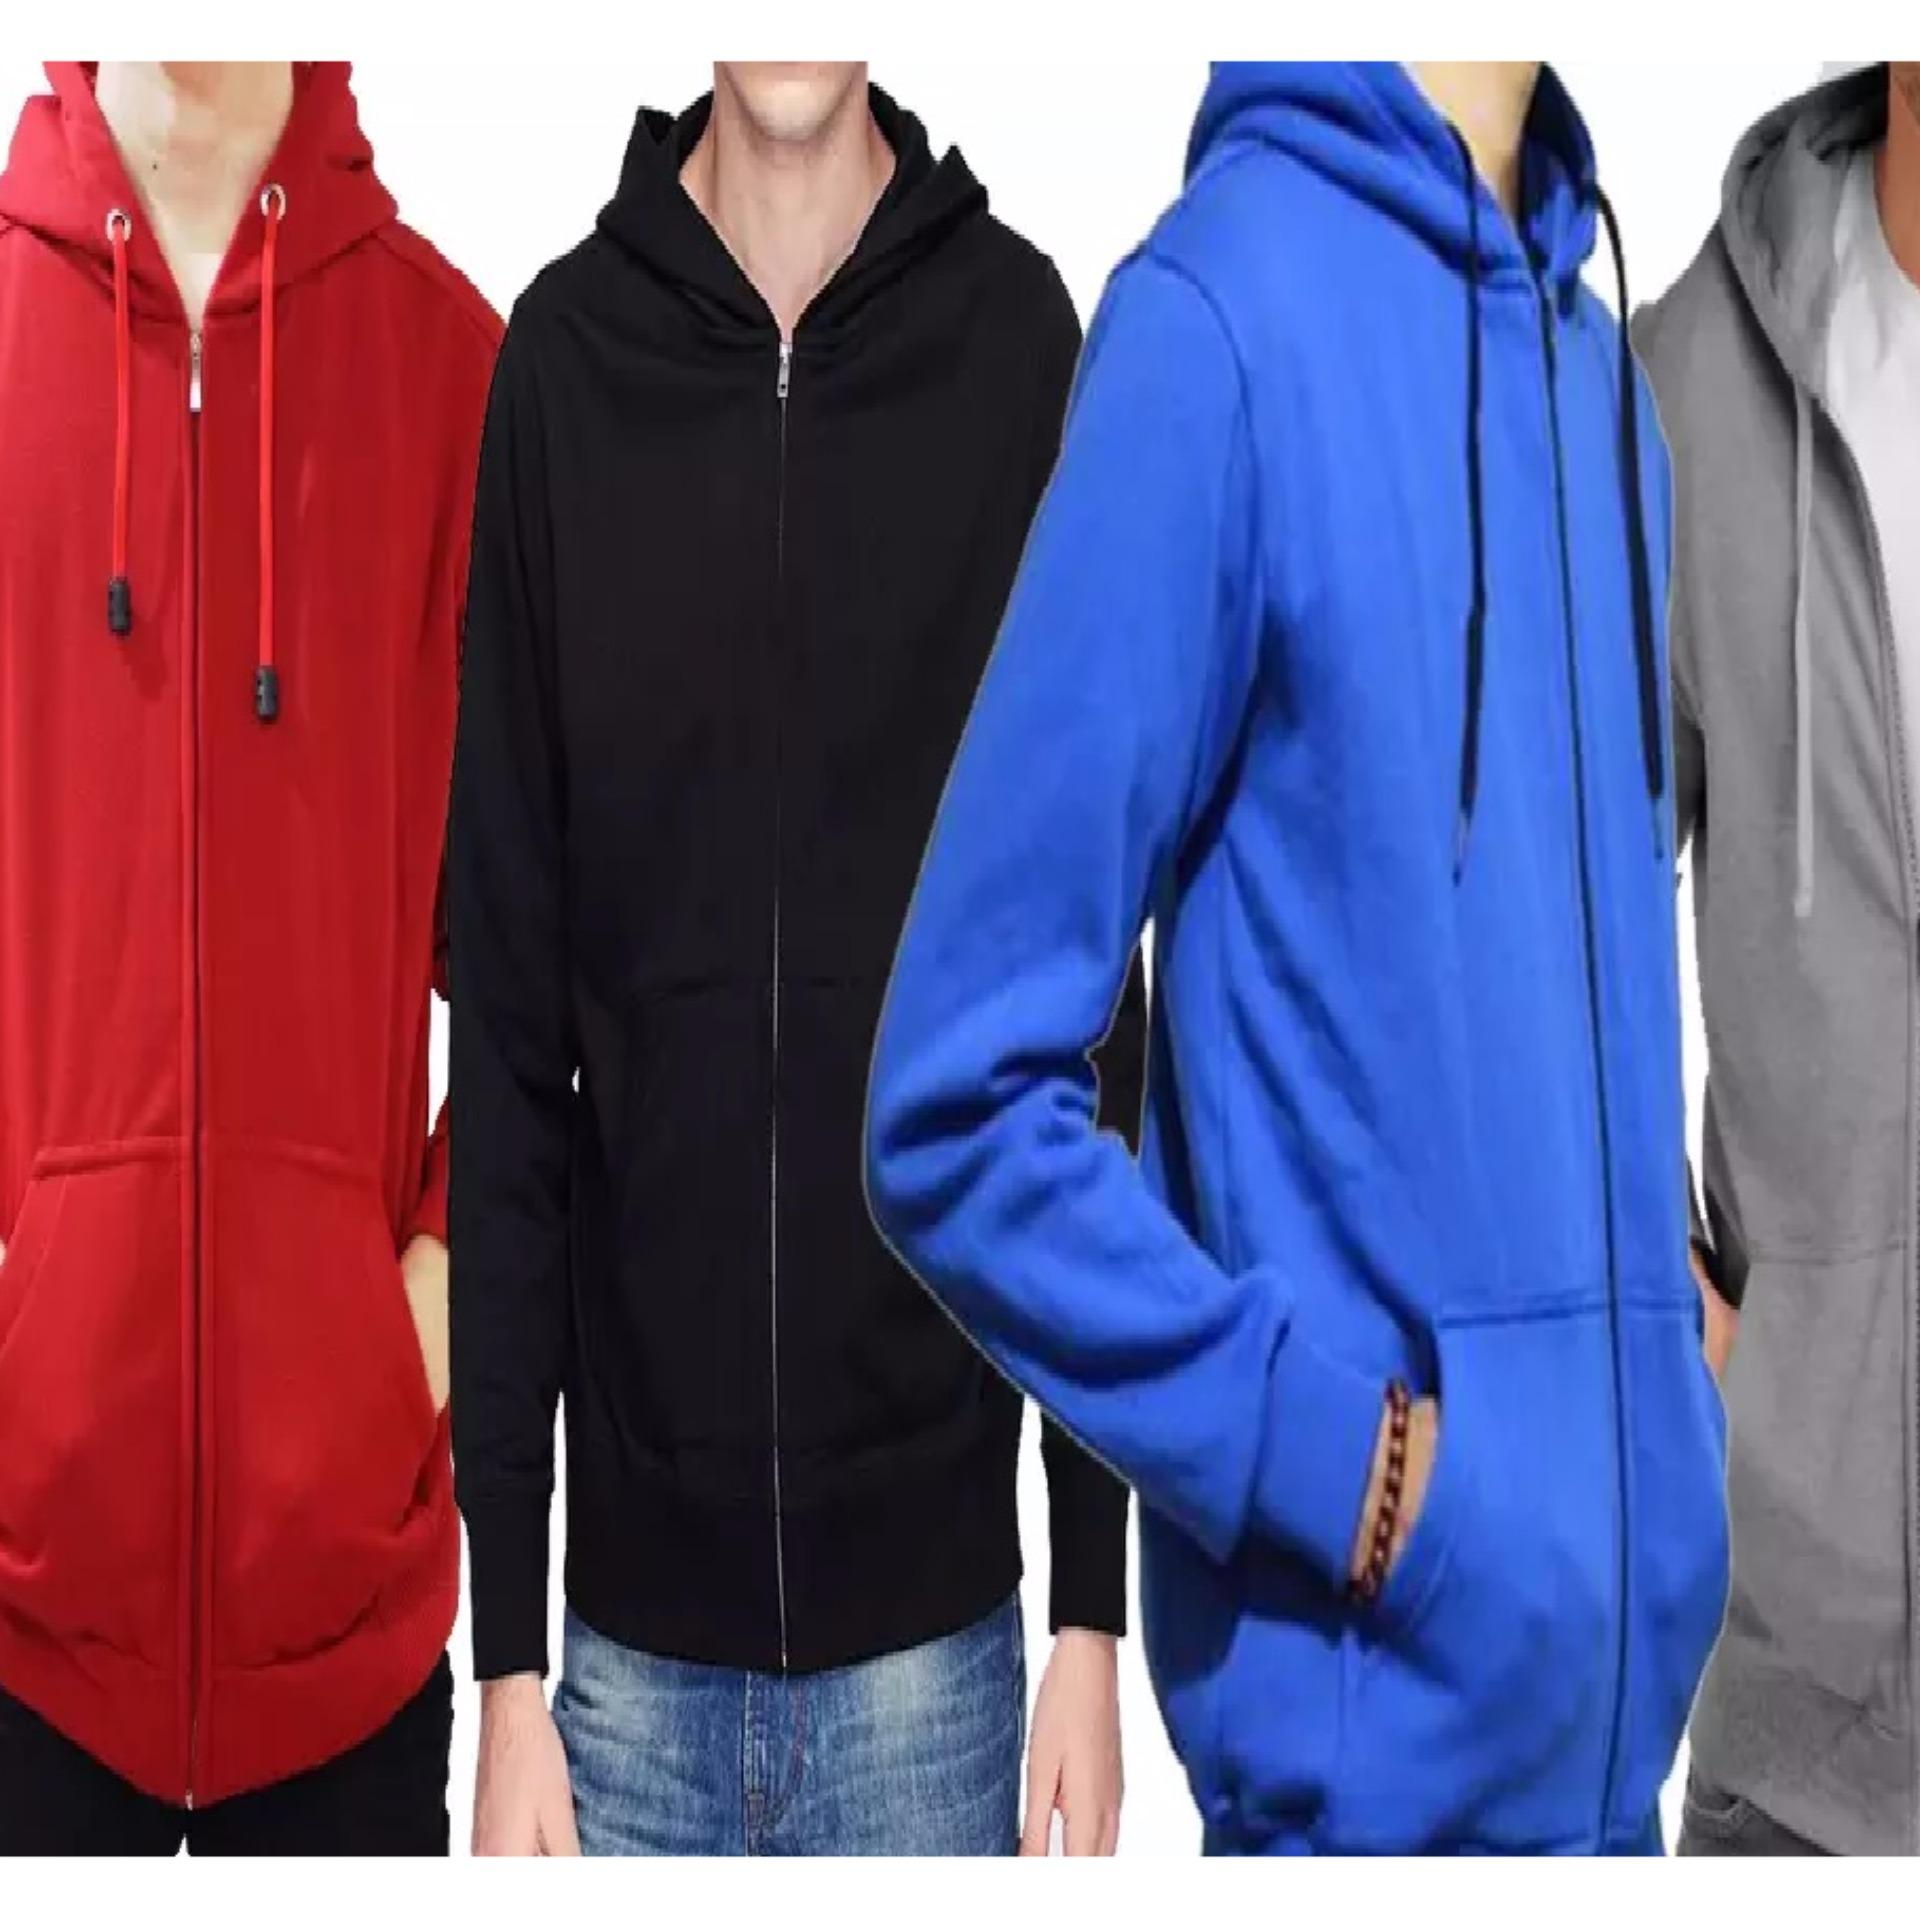 Hot Deals Jaket Sweater Hoodie Zipper Jumper Polos Untuk Pria Unisex Wanita High Quality Urgan